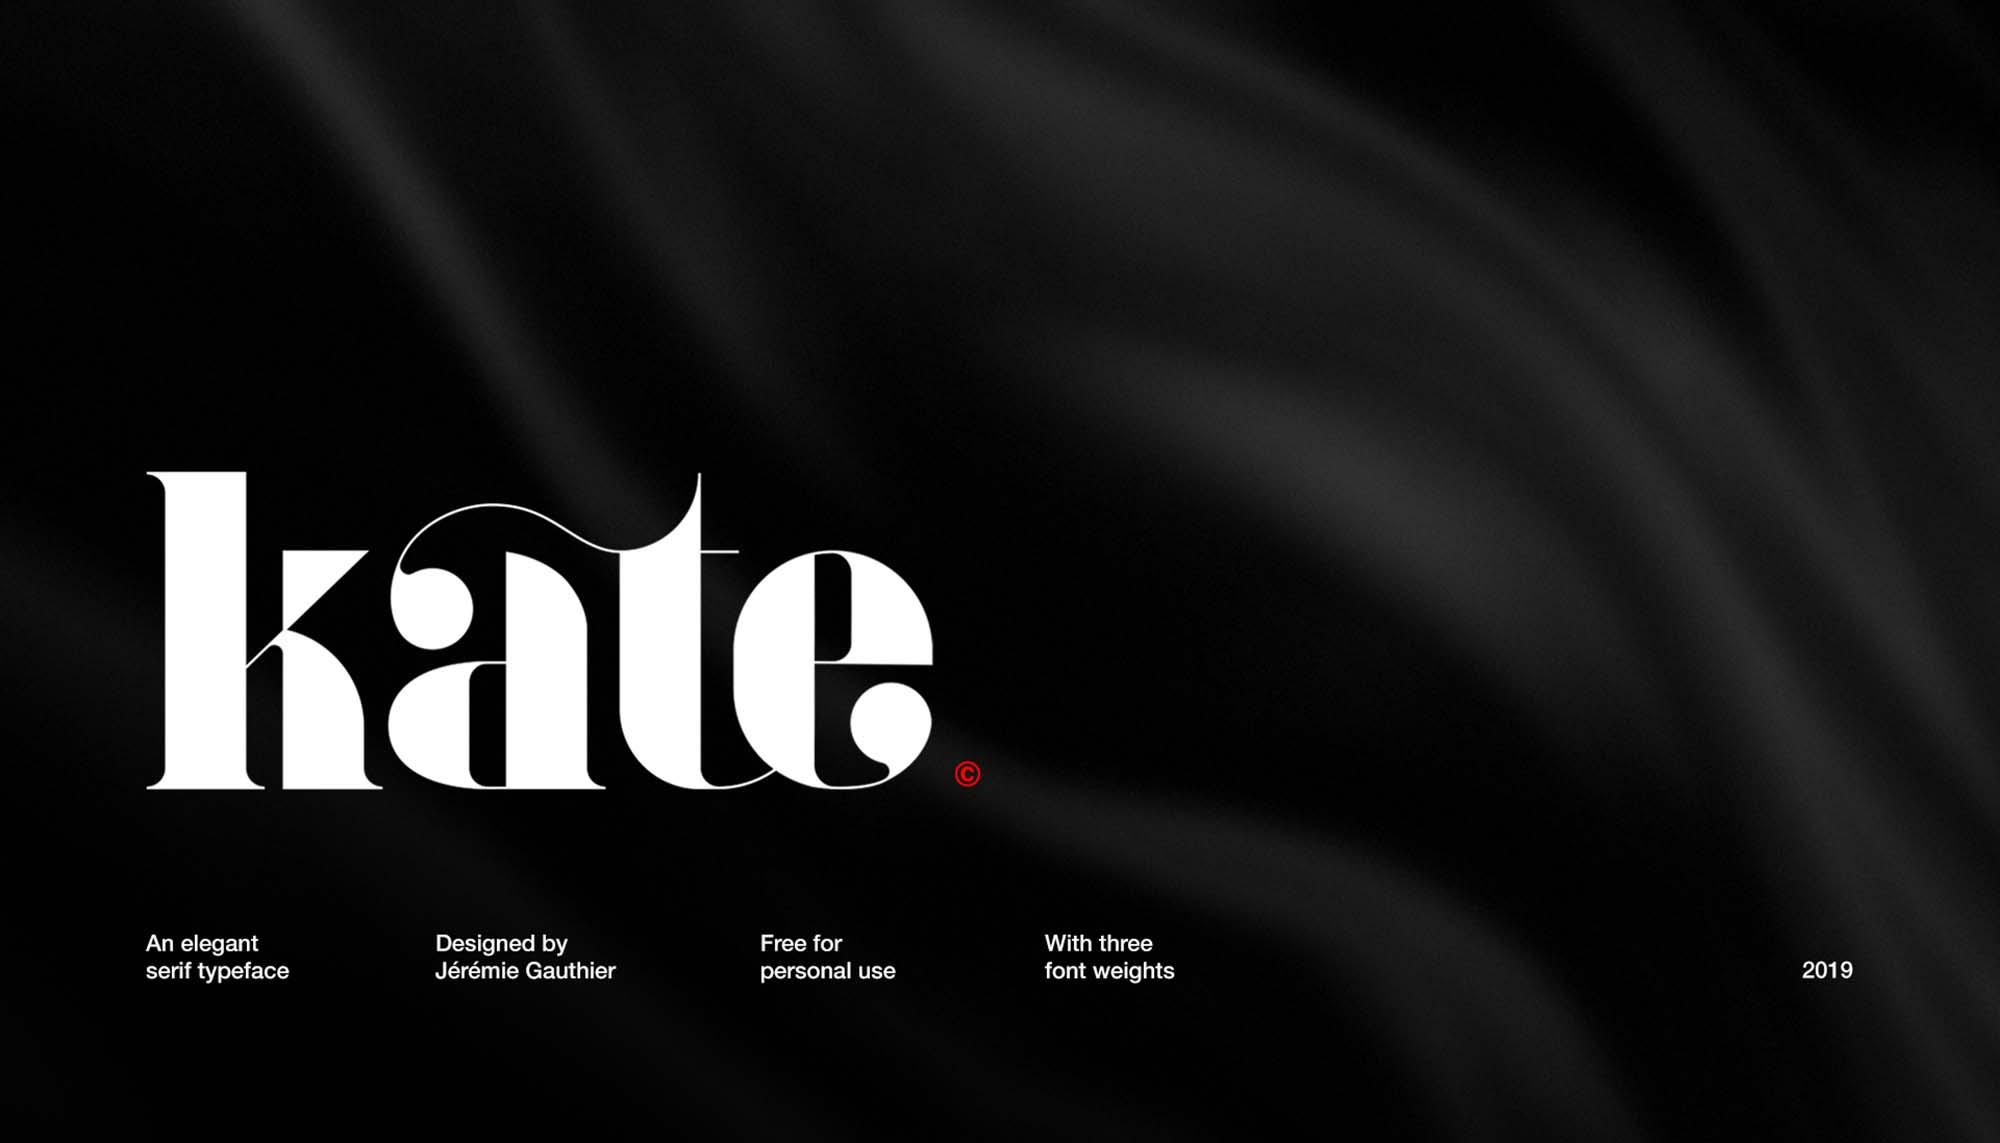 Kate Font